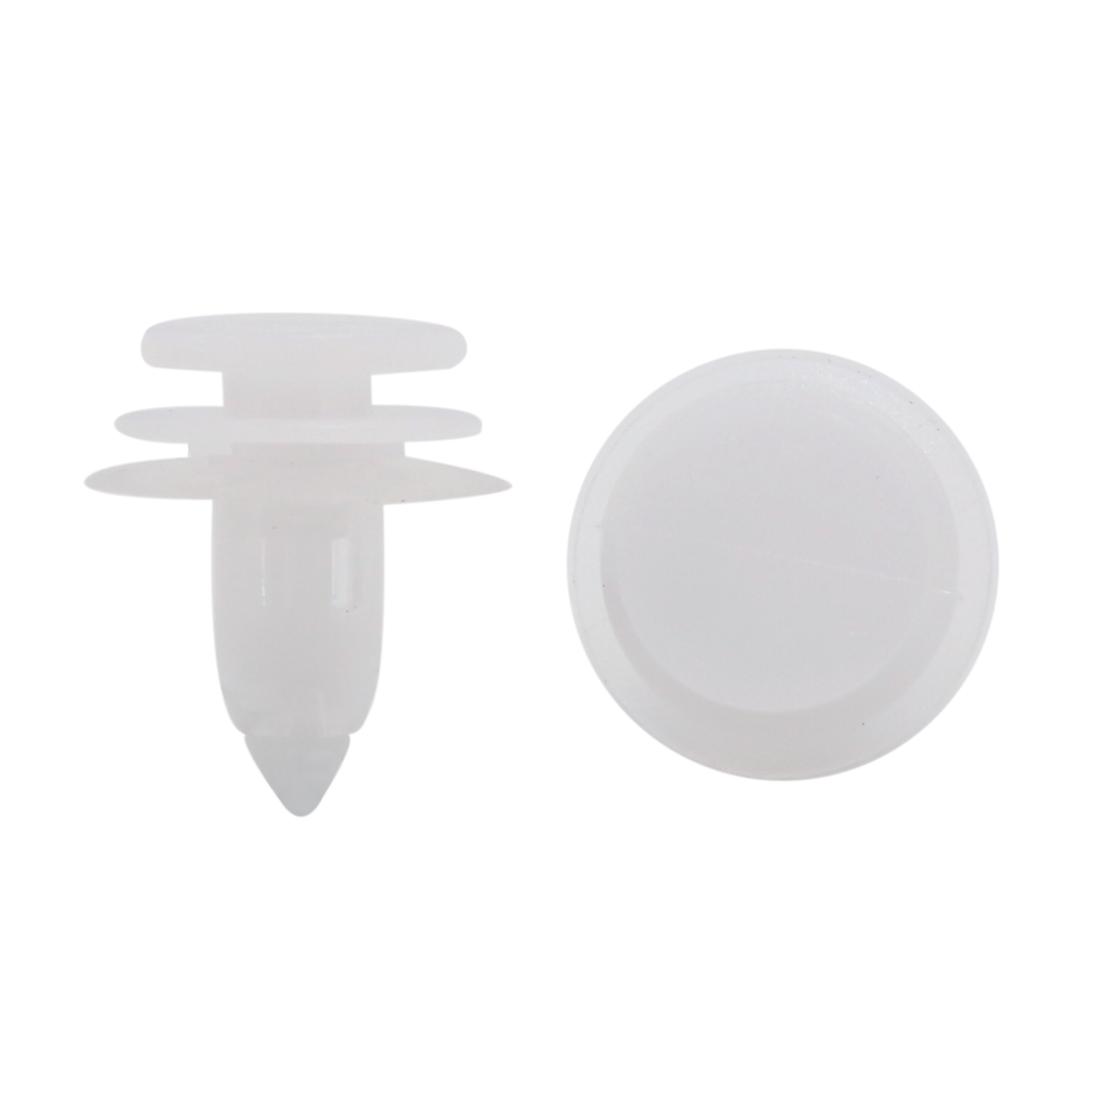 8mm Hole 18mm Head Auto Car Plastic Rivets Trim Fastener Clips White 20 Pcs